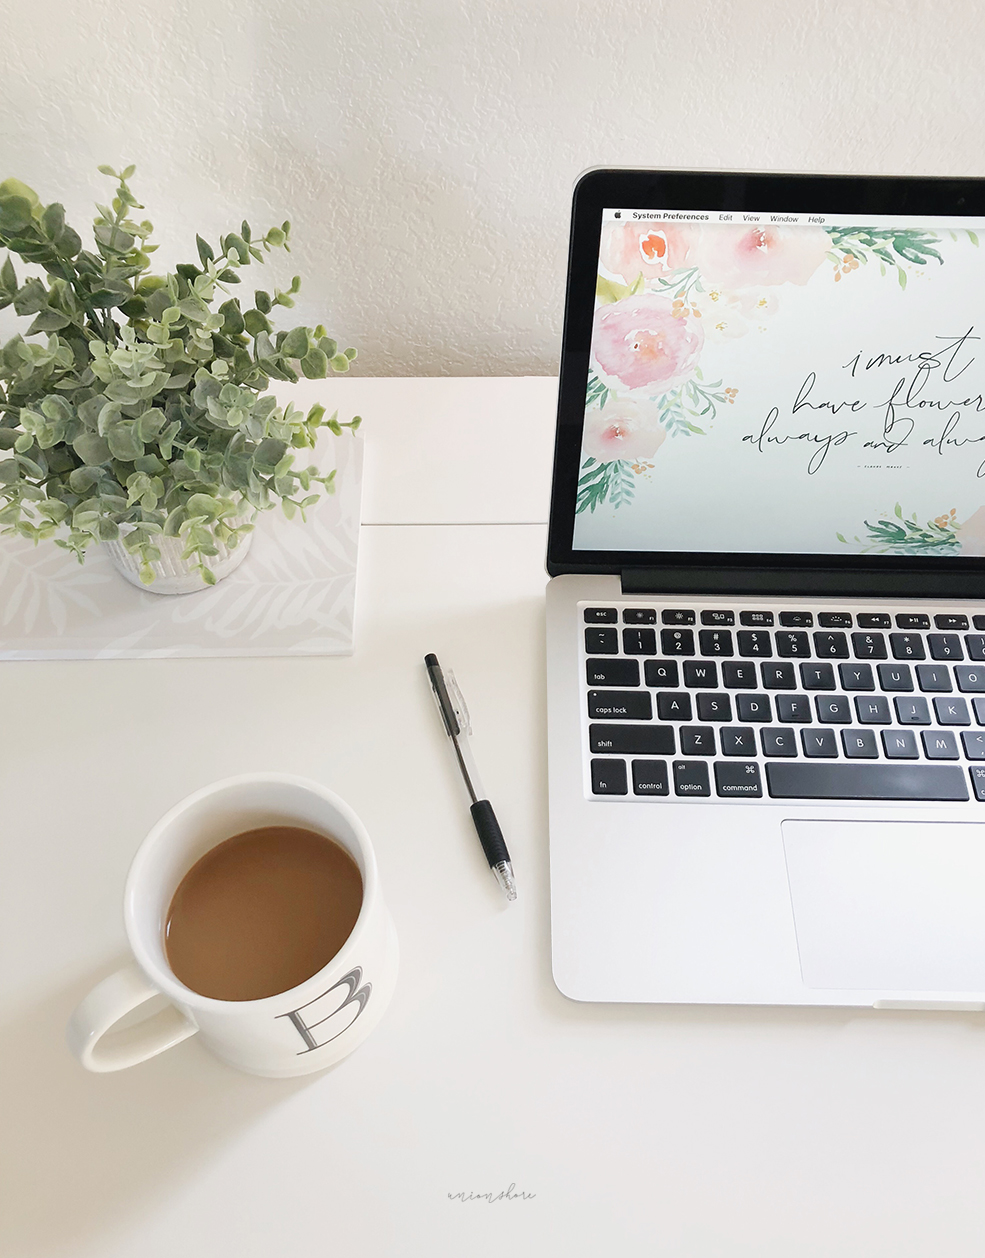 Spring Blooms   A Desktop Wallpaper UNION SHORE journal 985x1258